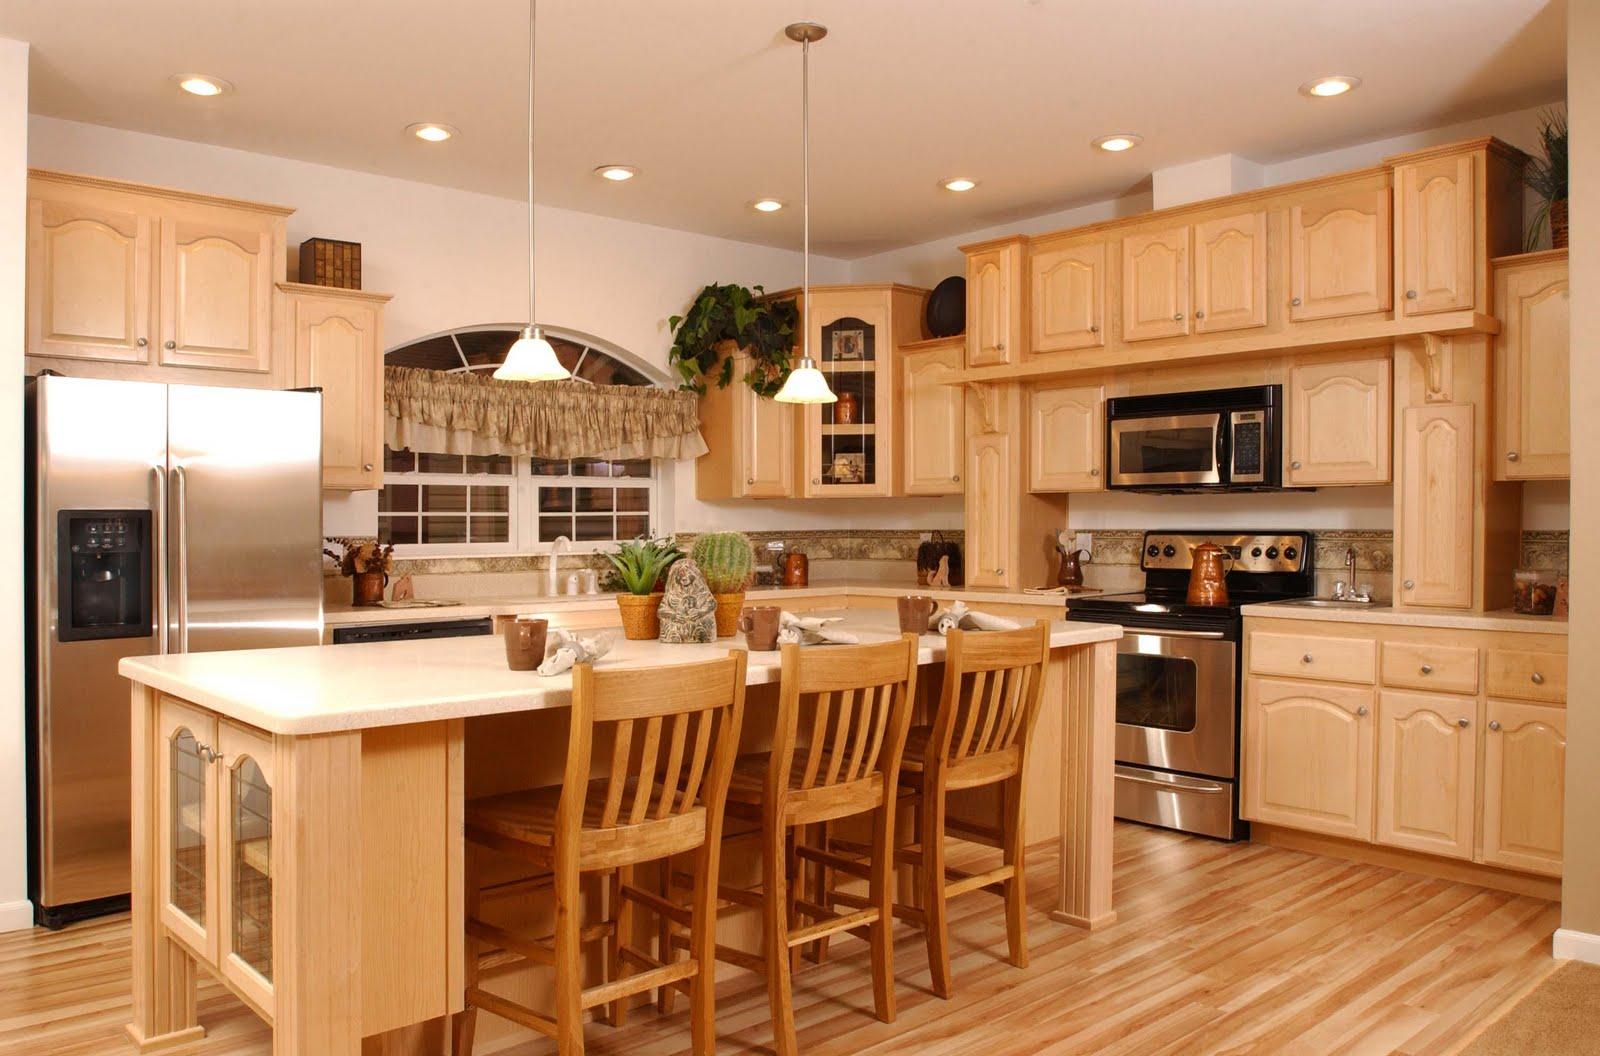 Best Woodworking Plans Book New Yankee Workshop Kitchen Cabinets Wooden Plans